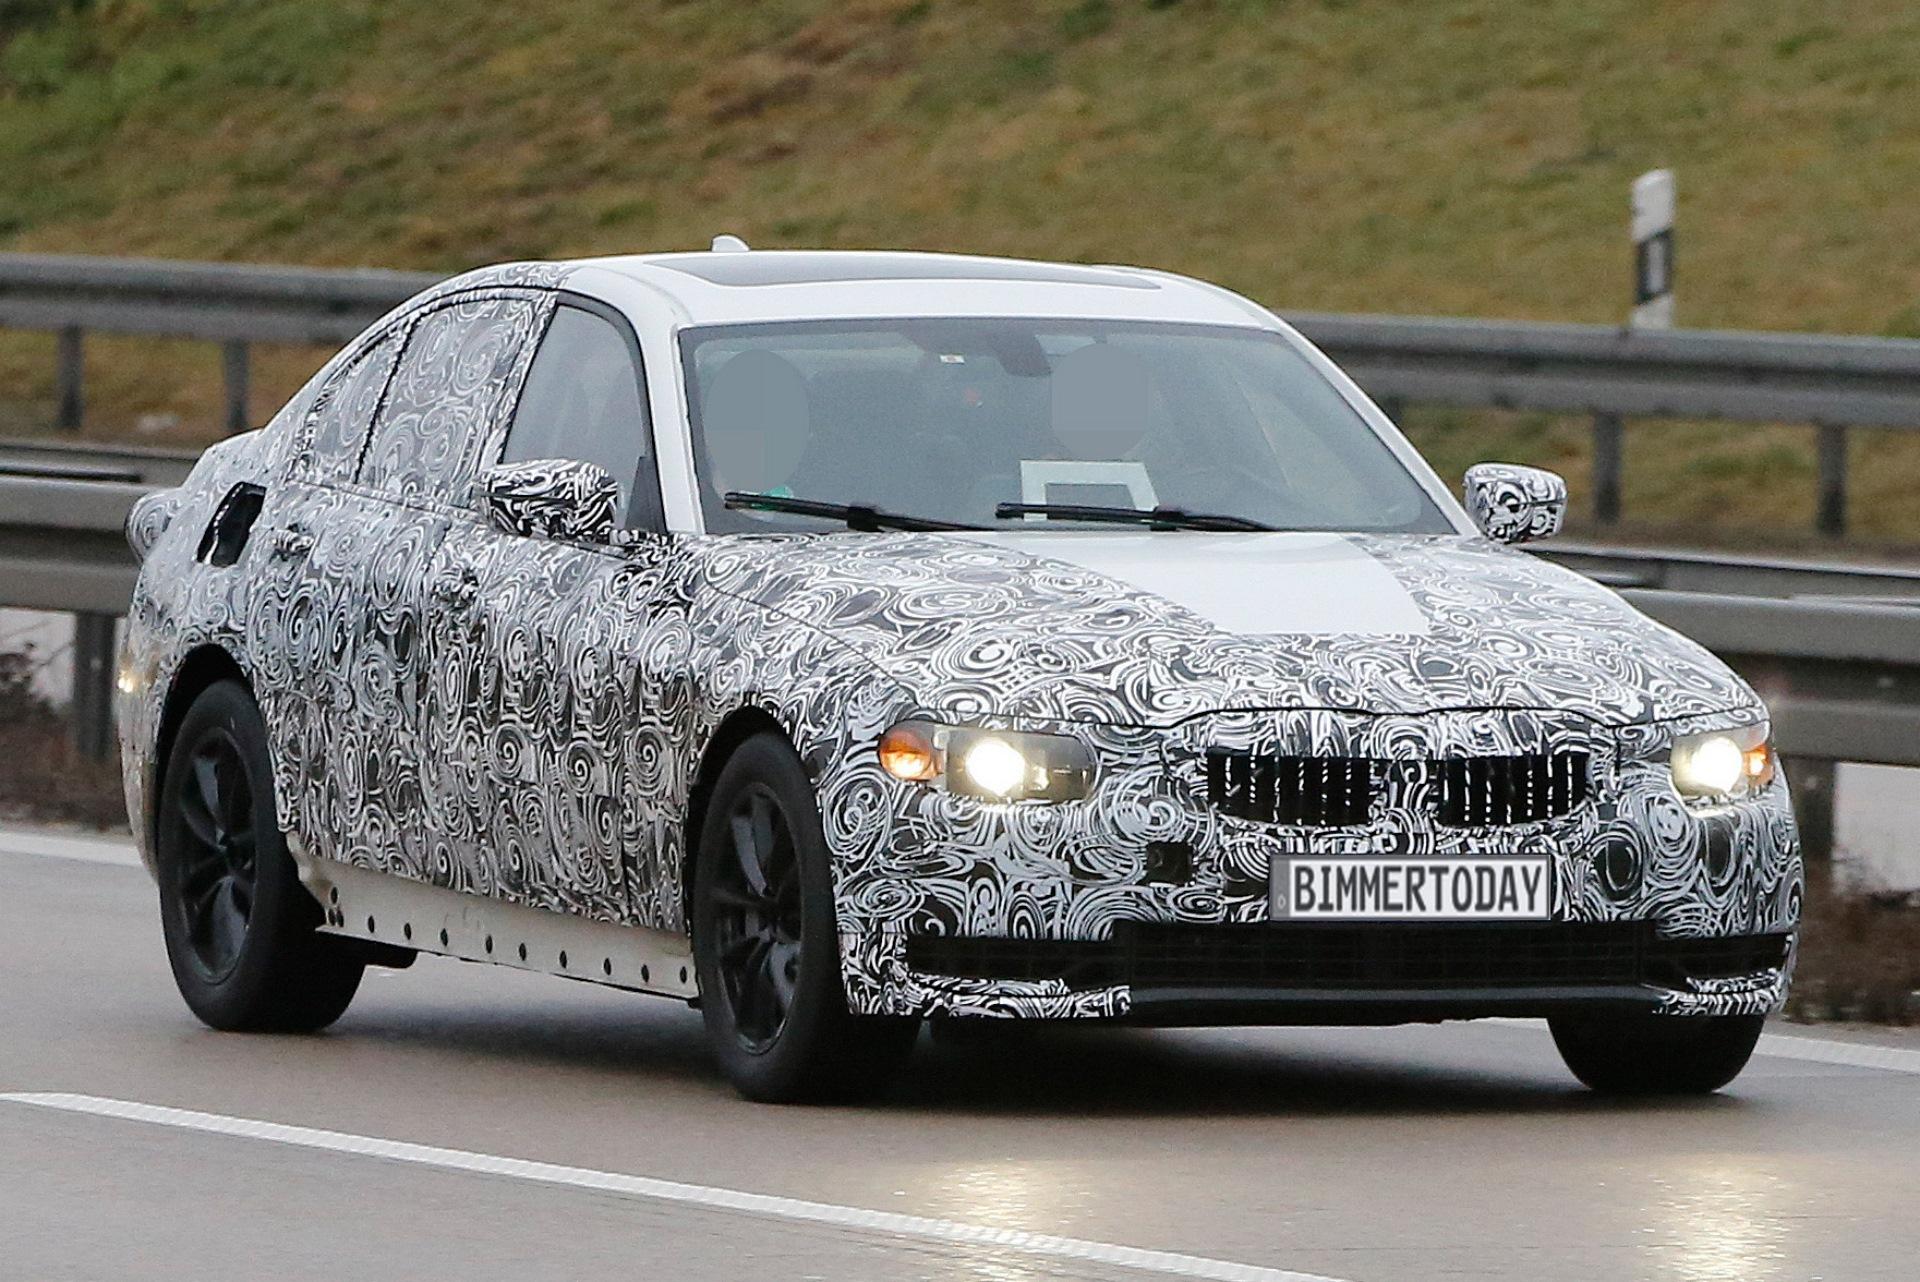 I3 Bmw 2018 >> BMW 3er G20: Erste Erlkönig-Fotos zeigen F30-Nachfolger